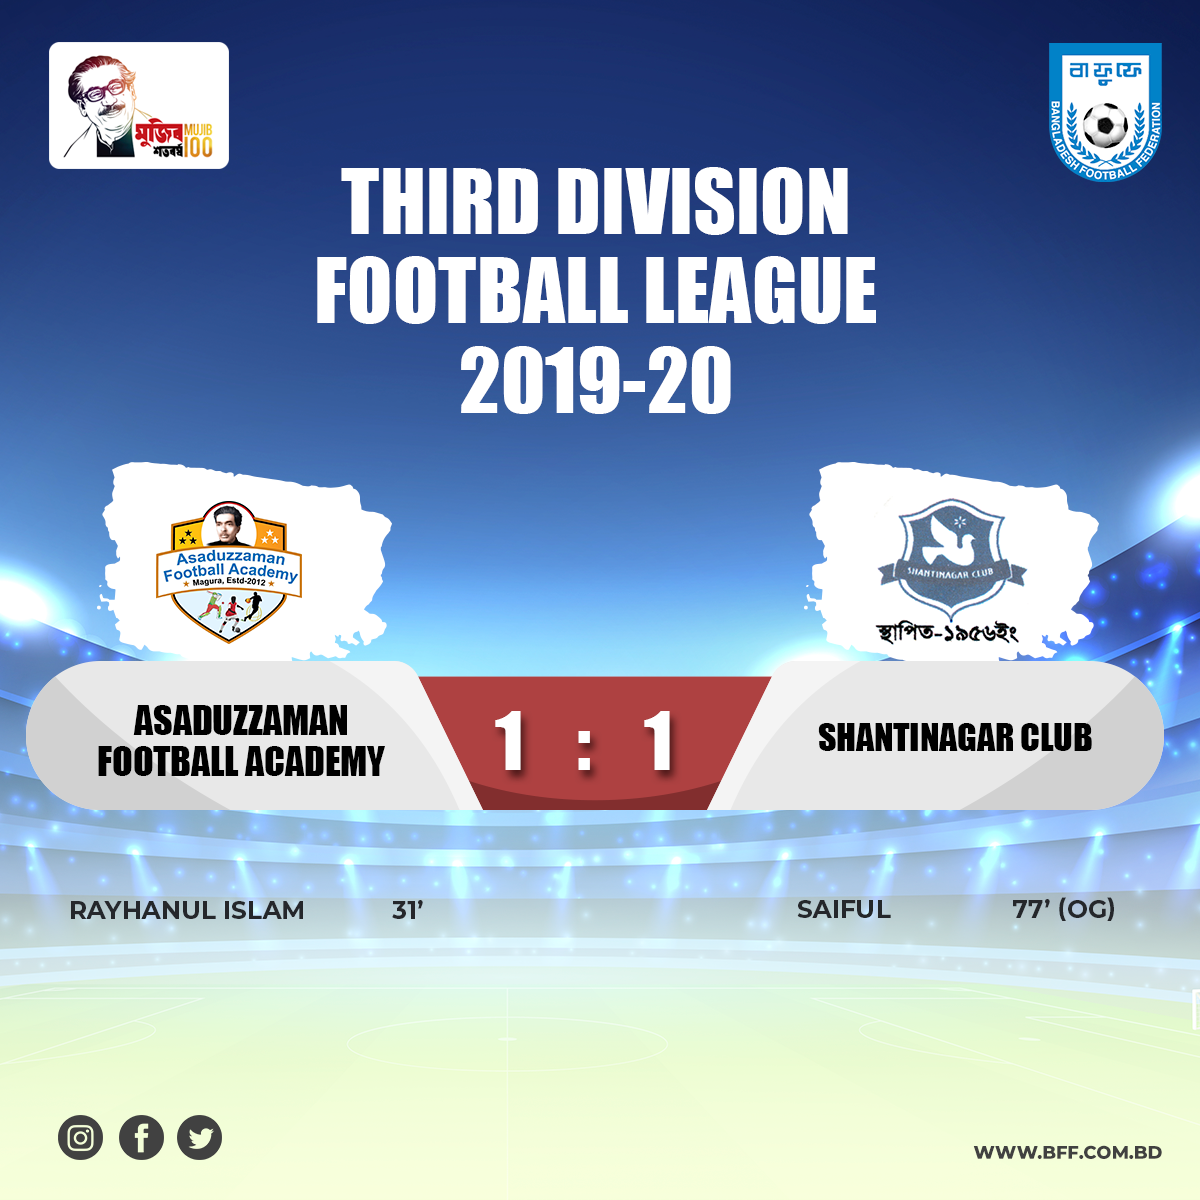 Asaduzzaman Football Academy and Shantinagar Club draws match